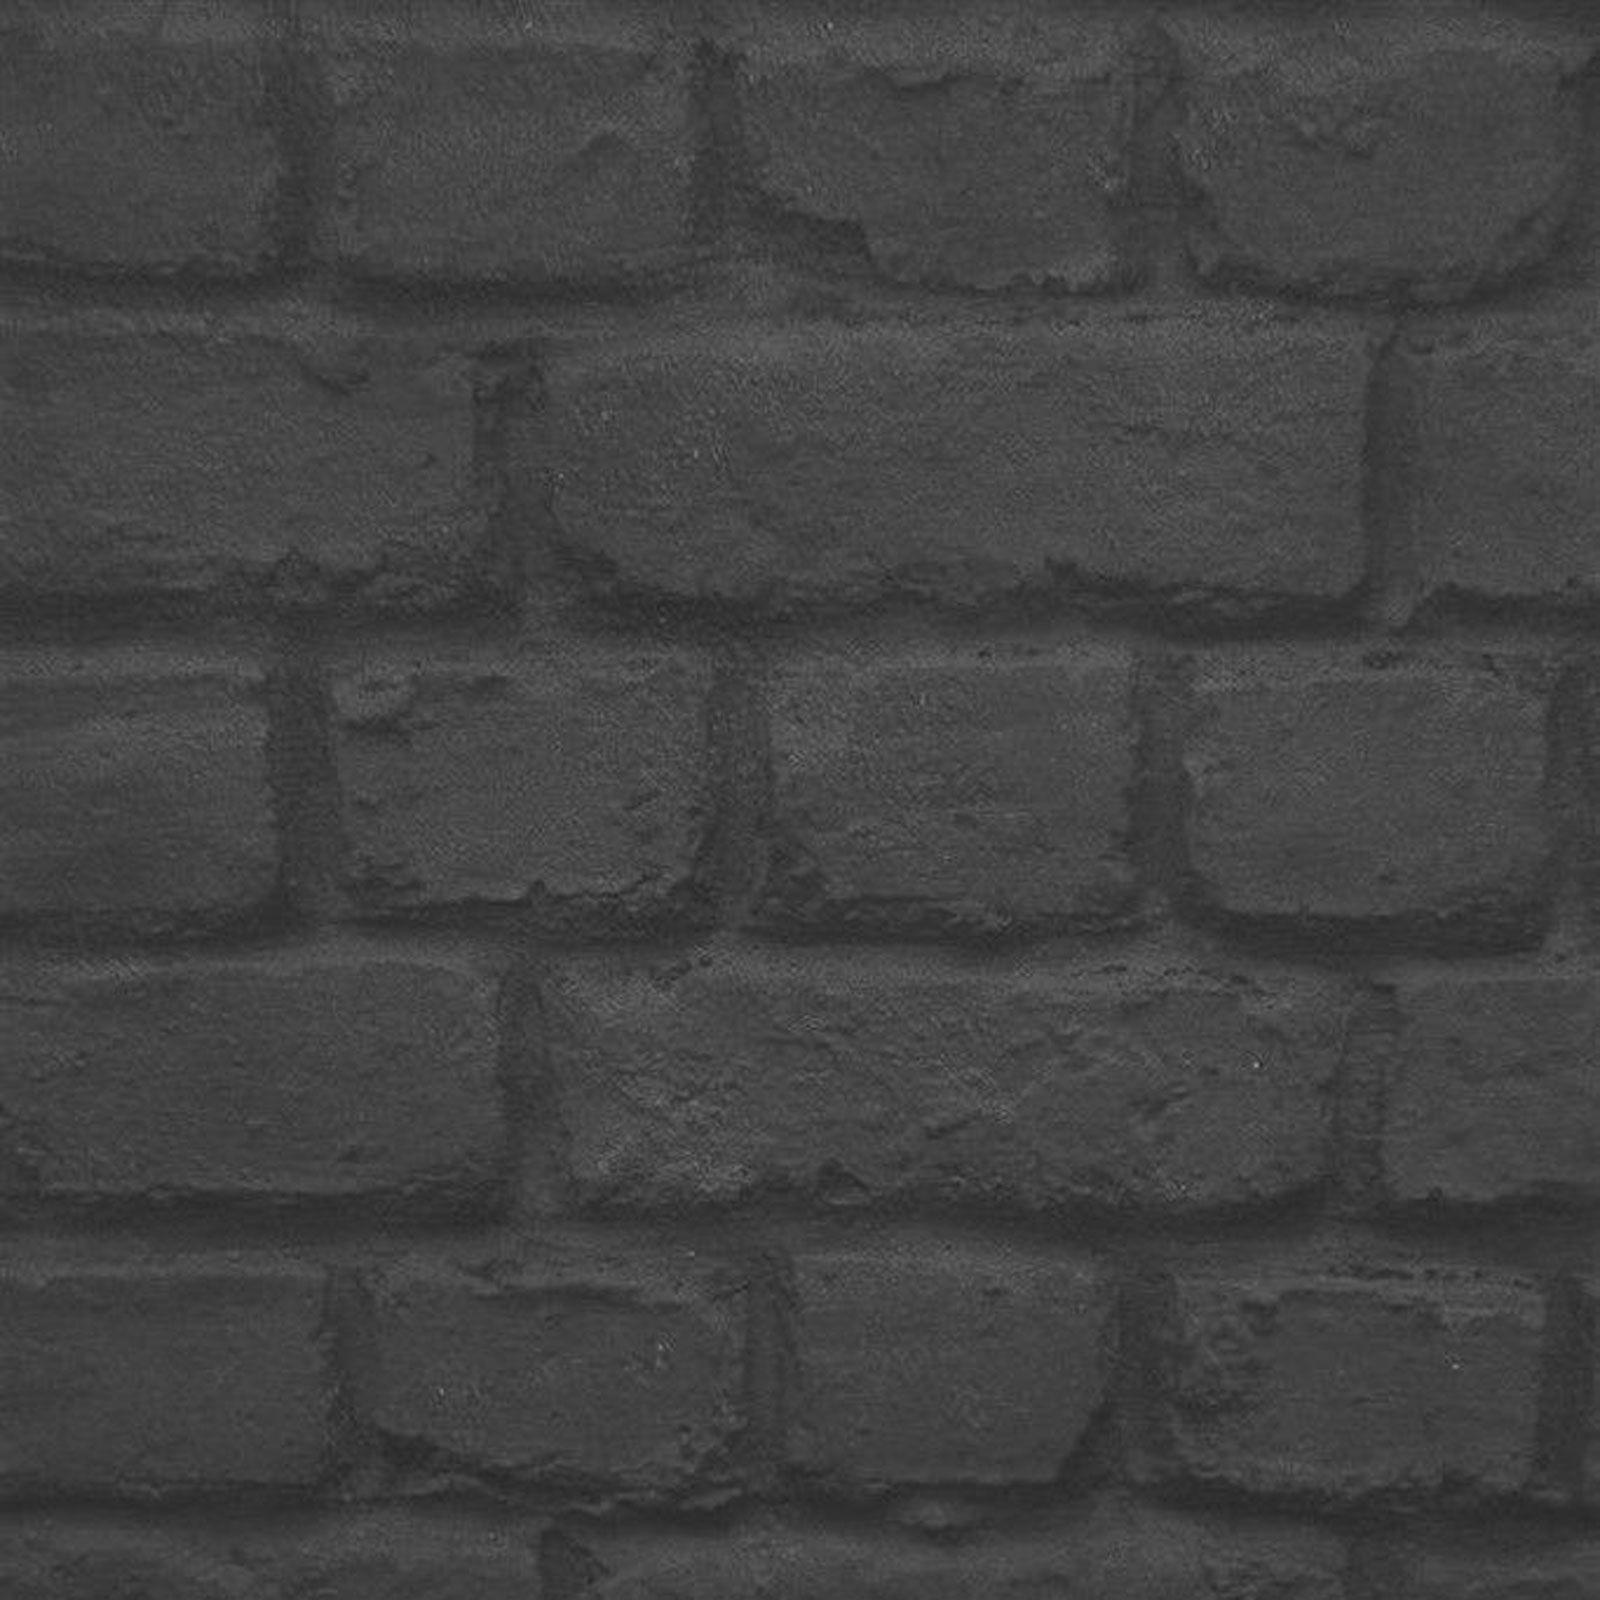 Schwarze Backstein Tapete : Black and Grey Textured Brick Wall